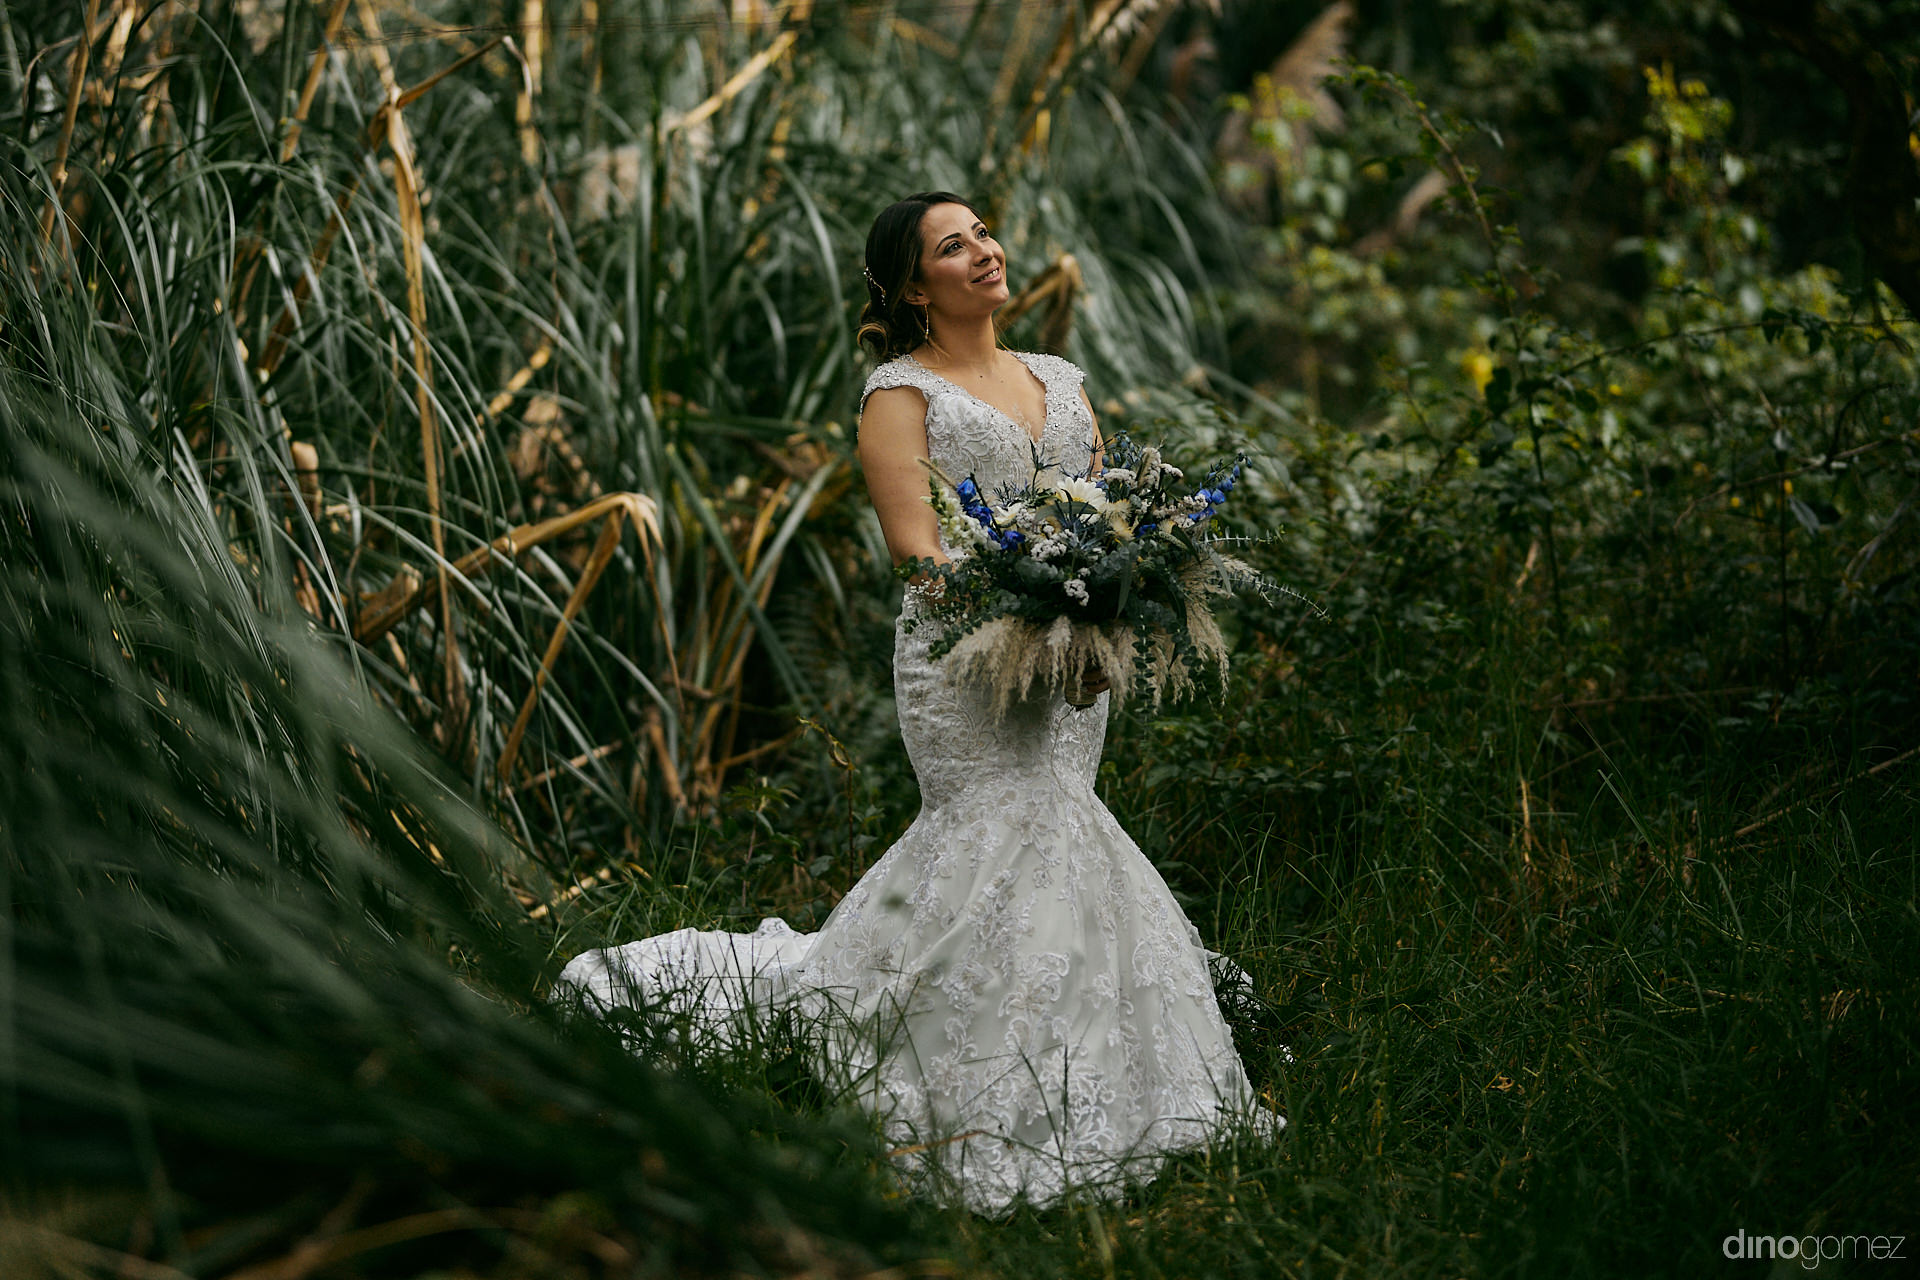 018 - Diy Budget Destination Weddings Can Be Prety Too!